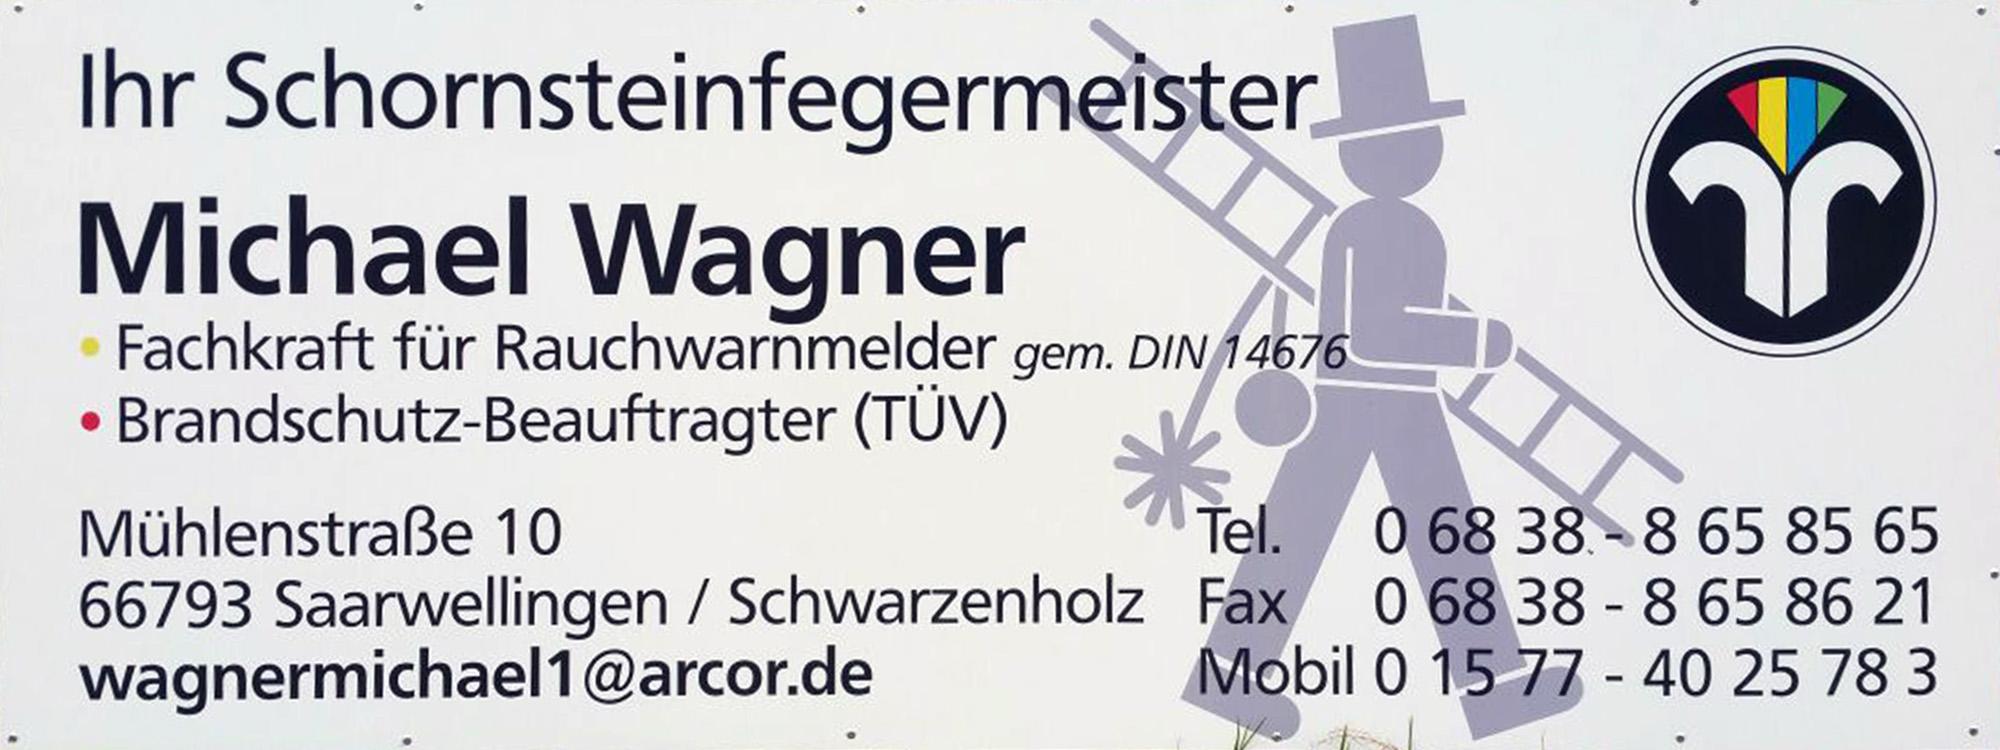 Schornsteinfegermeister Wagner